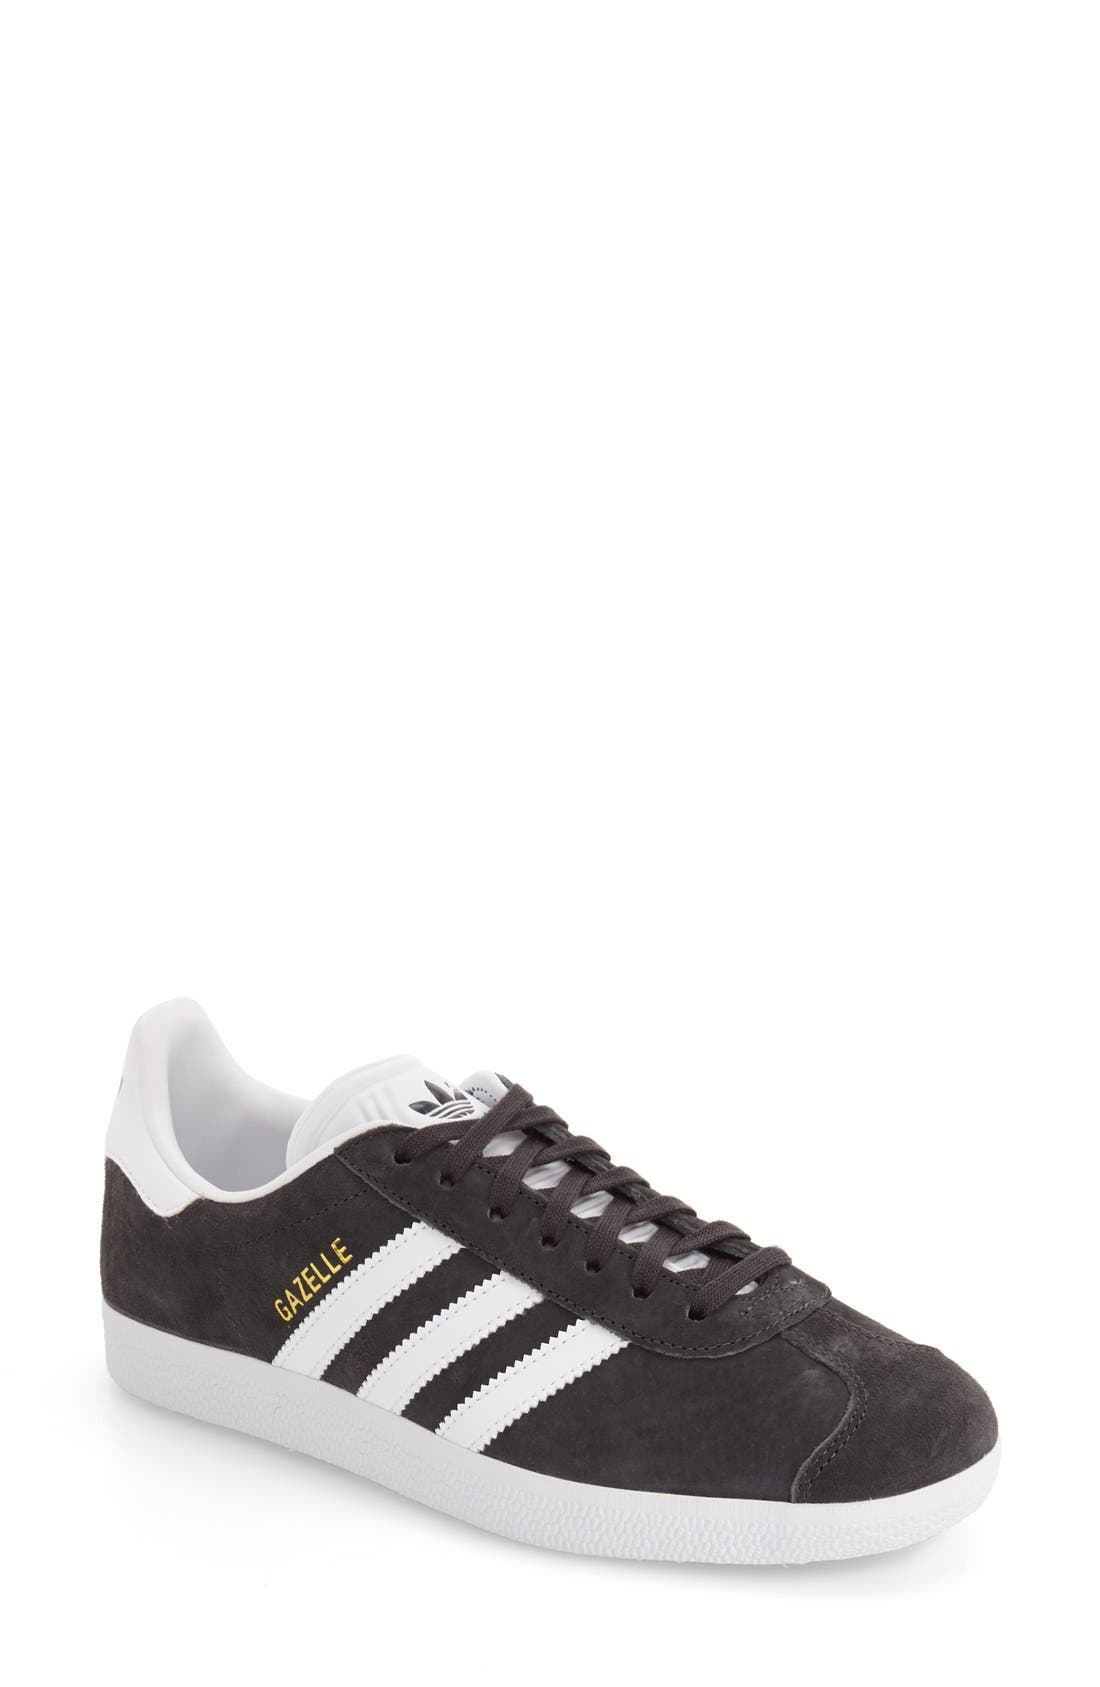 Gazelle Sneaker,                             Main thumbnail 1, color,                             Solid Grey